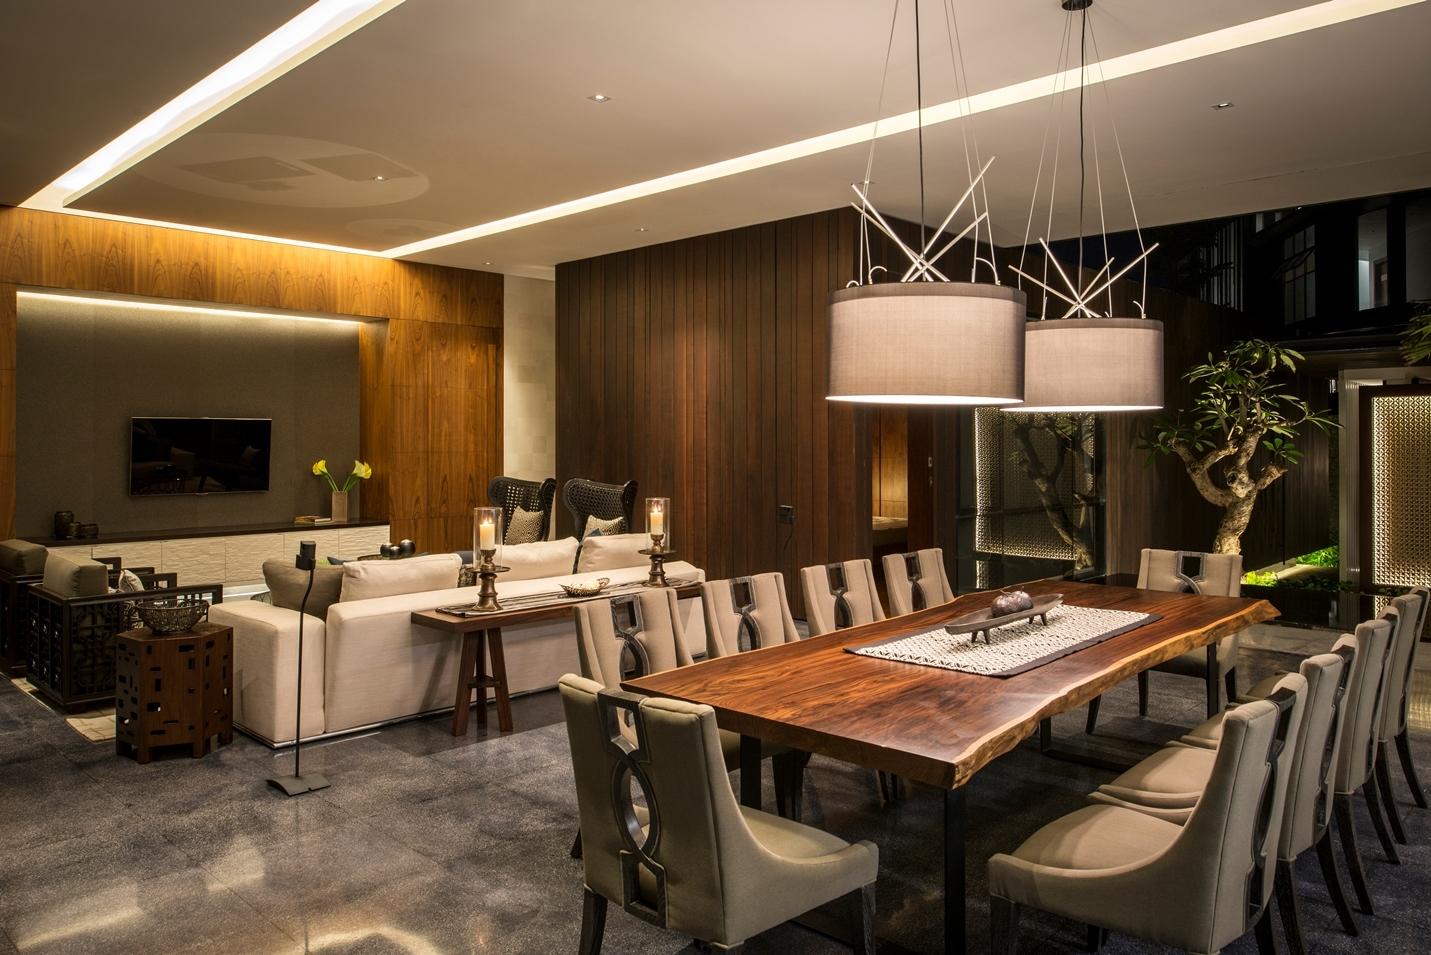 Modern Resort Villa With Balinese Theme IDesignArch Interior Design Architecture Amp Interior